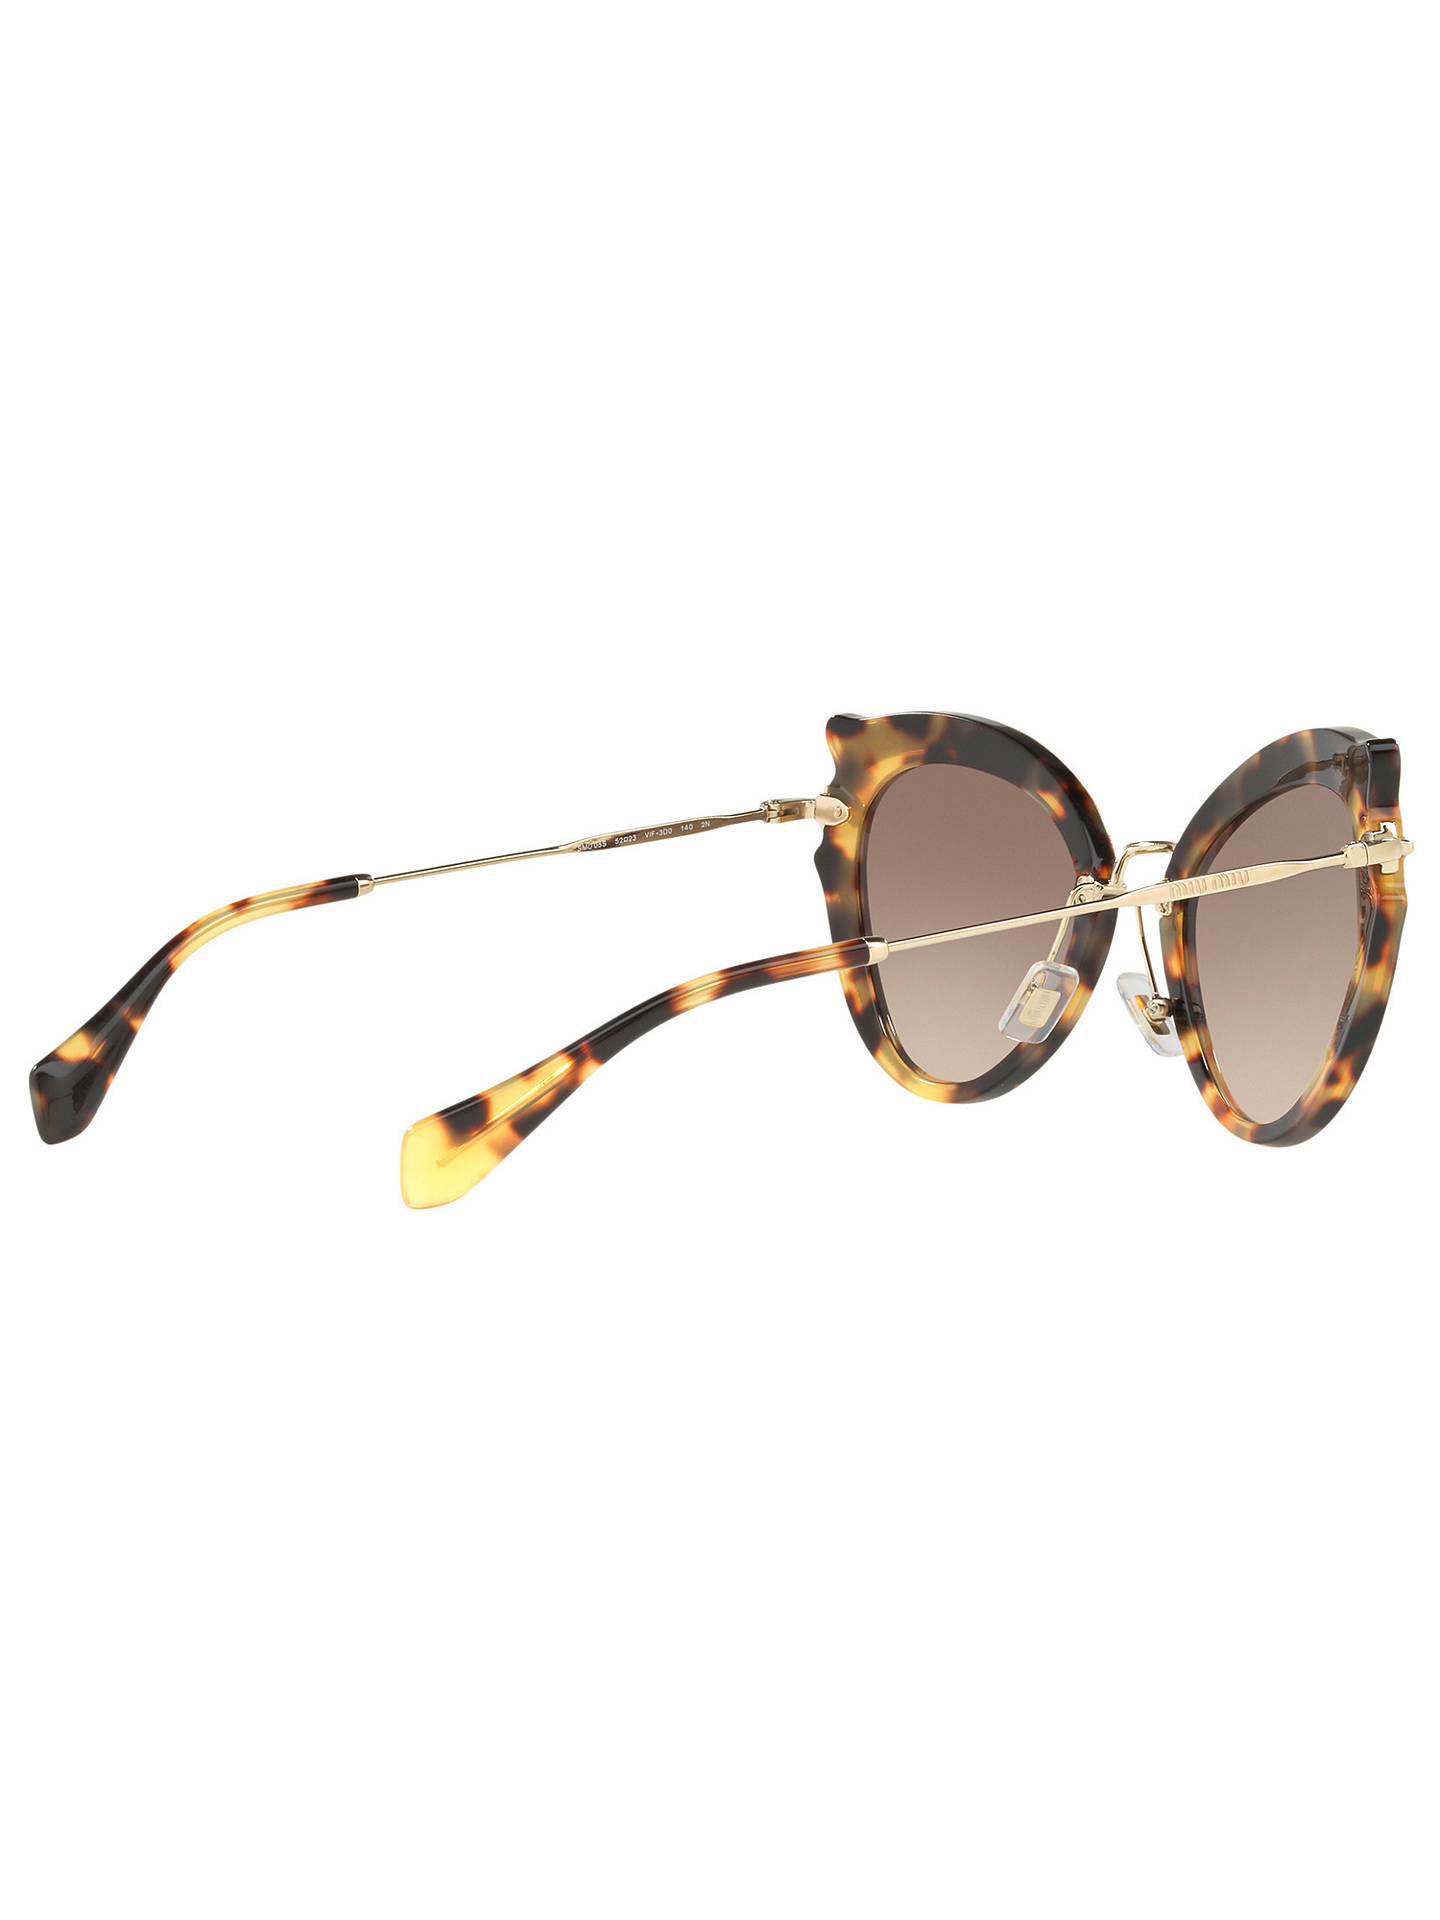 dca10b59af Miu Miu MU 05SS Cat s Eye Sunglasses at John Lewis   Partners